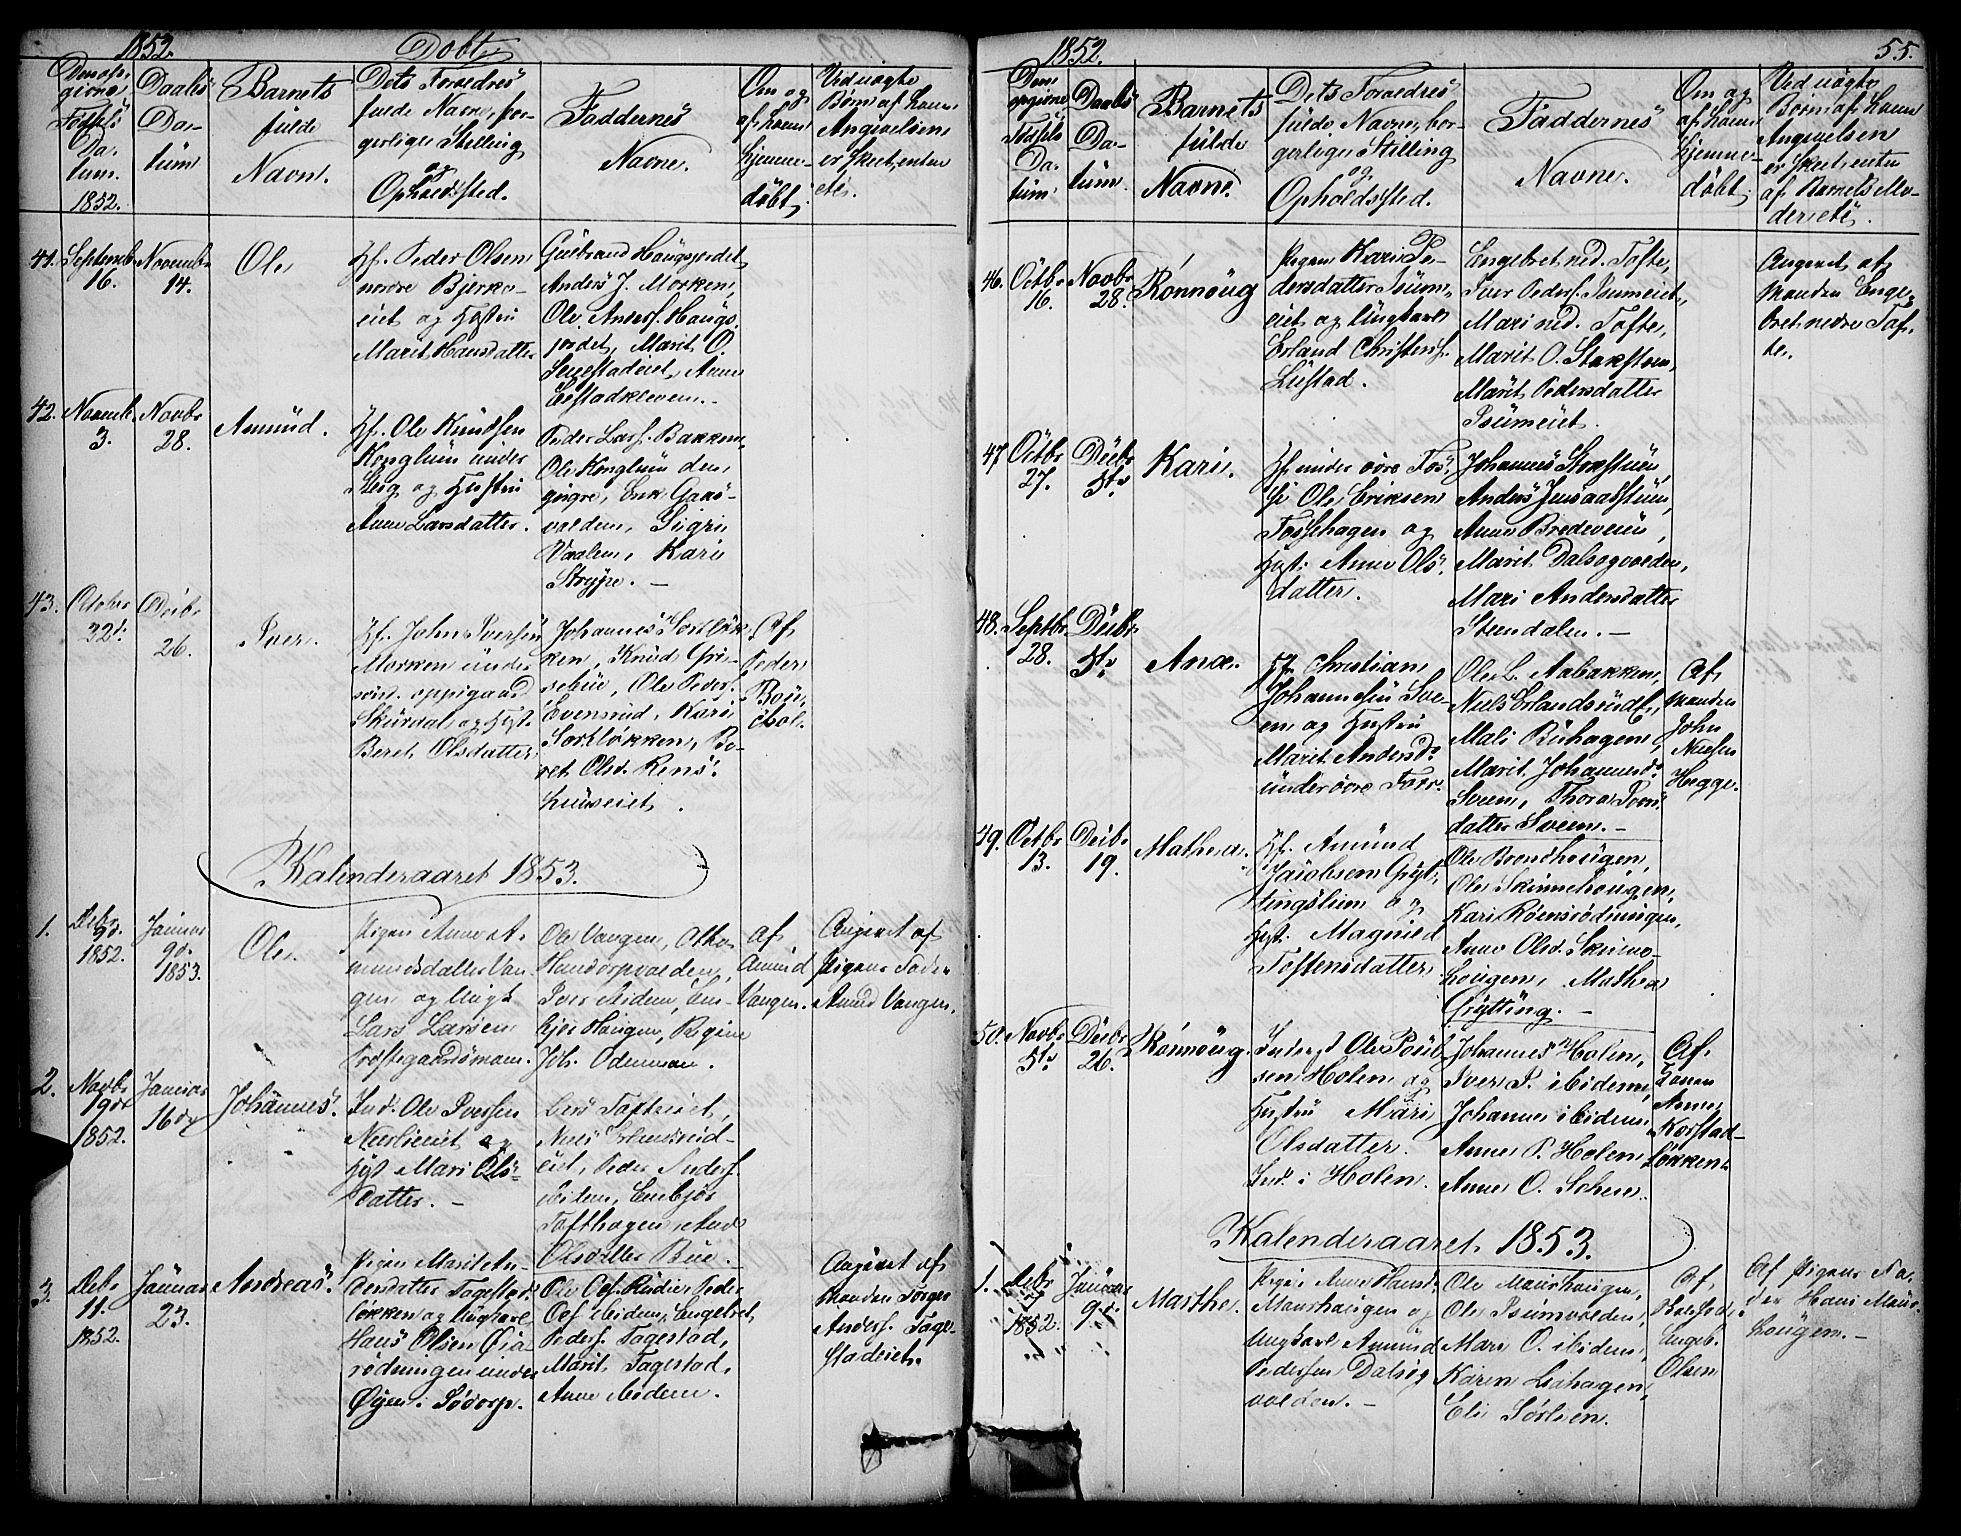 SAH, Sør-Fron prestekontor, H/Ha/Hab/L0001: Klokkerbok nr. 1, 1844-1863, s. 55